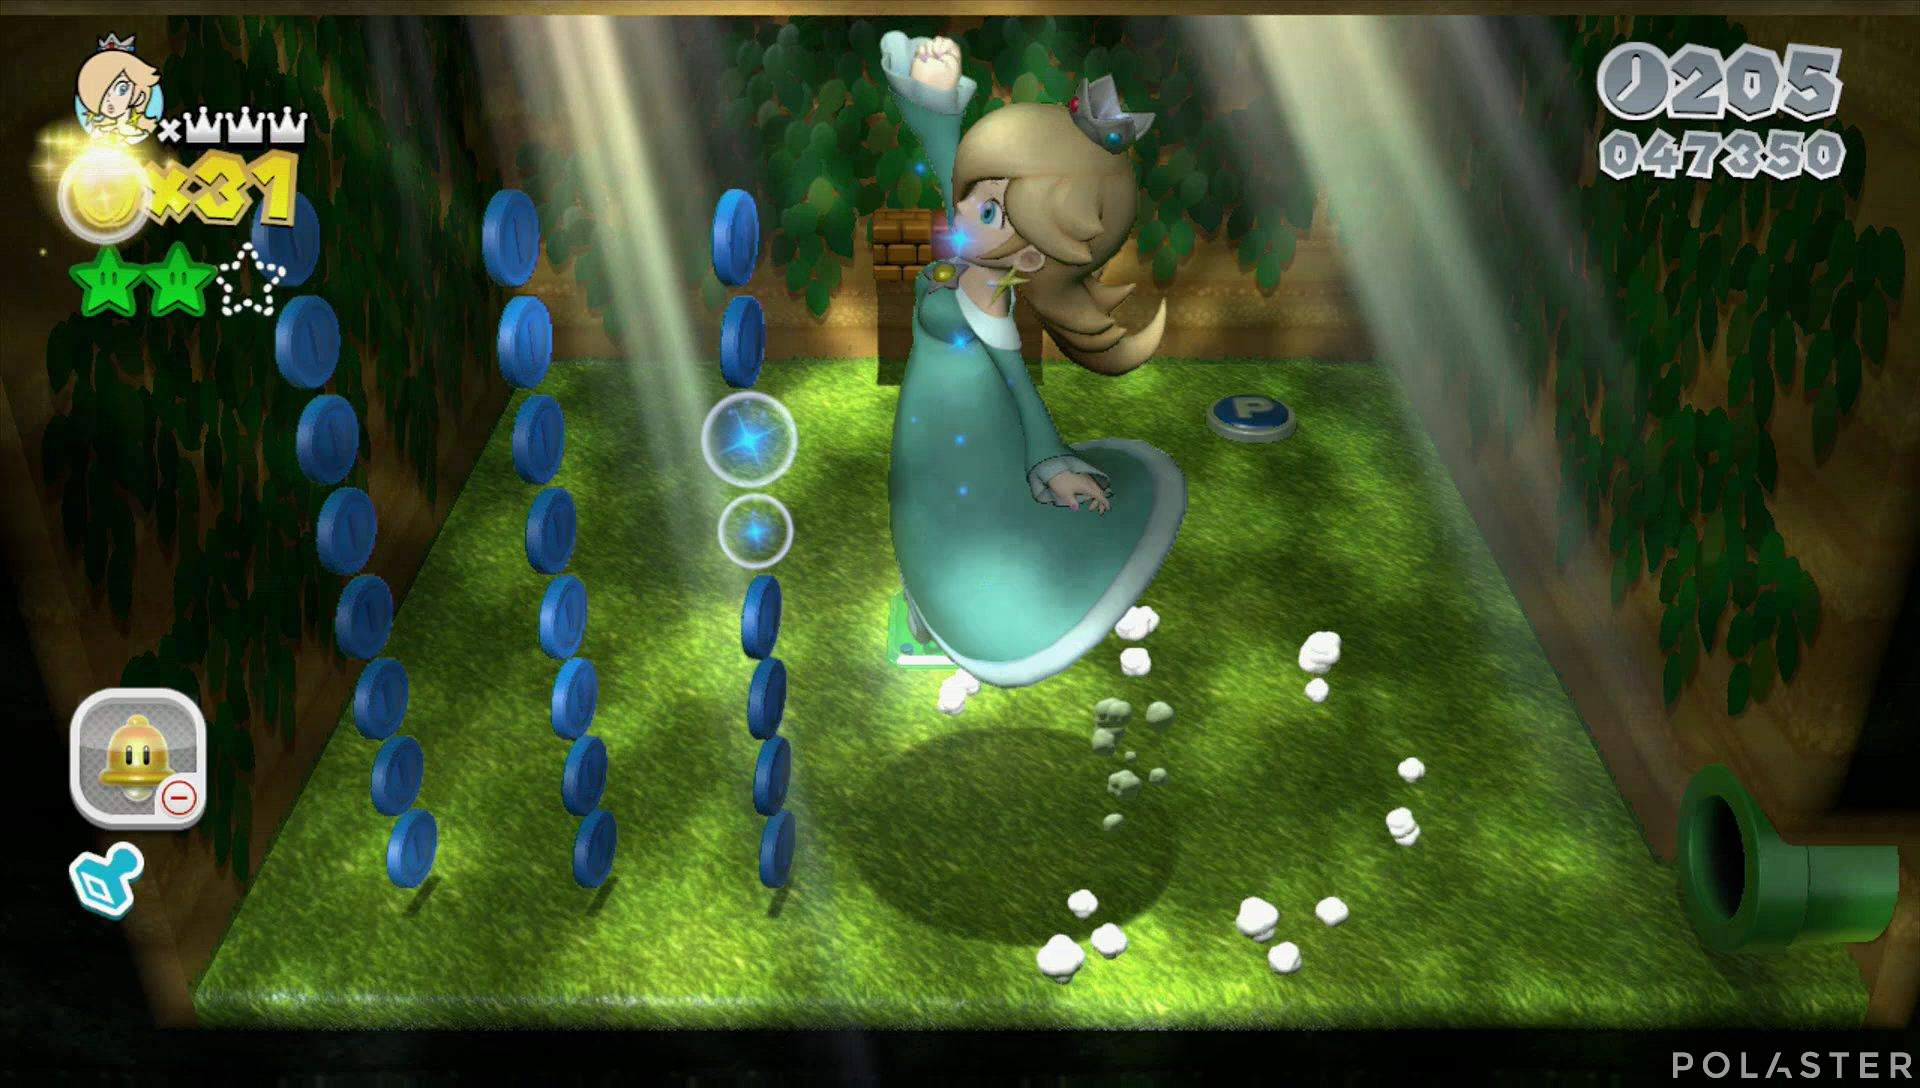 Super Mario 3D World Mundo Estrella-7 Estrella 3